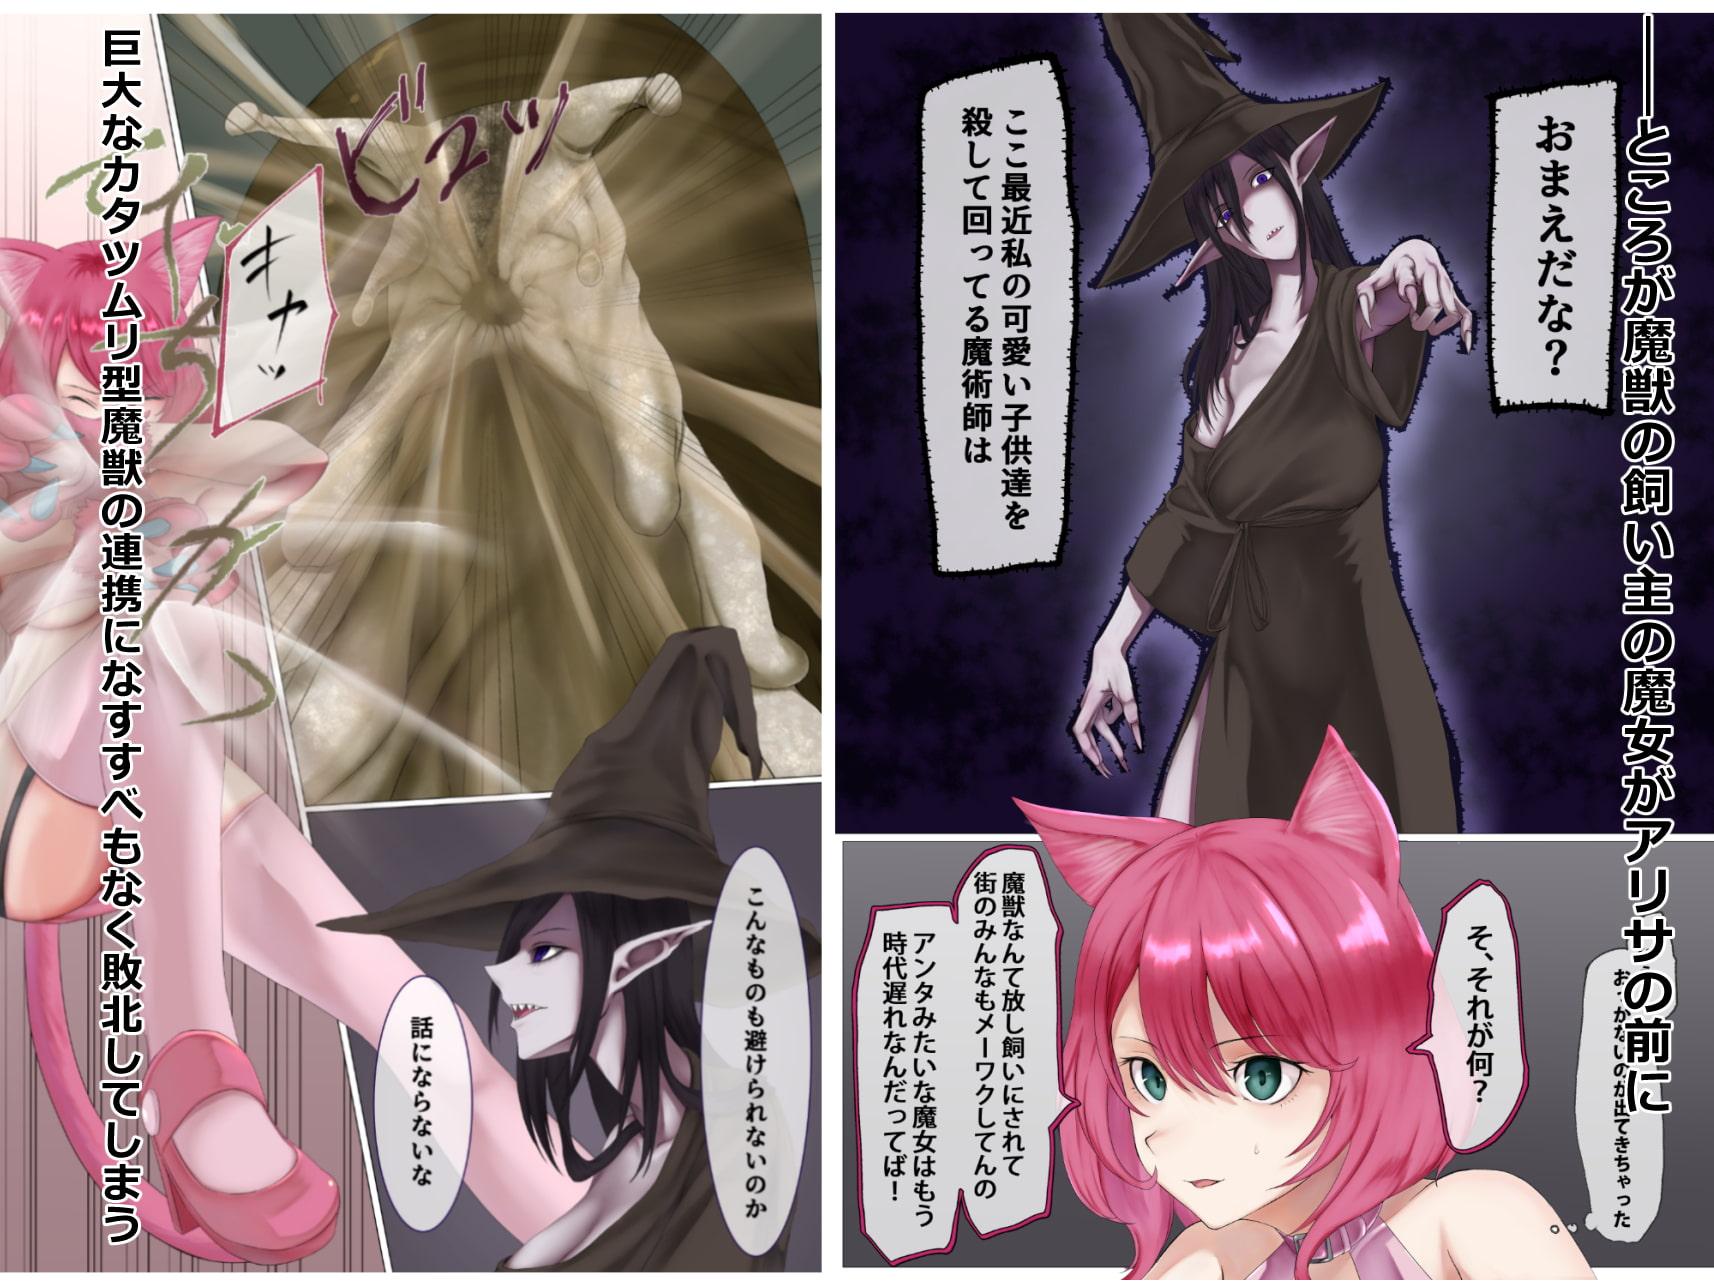 Catgirl Transforming Heroine's Defeat & Rape